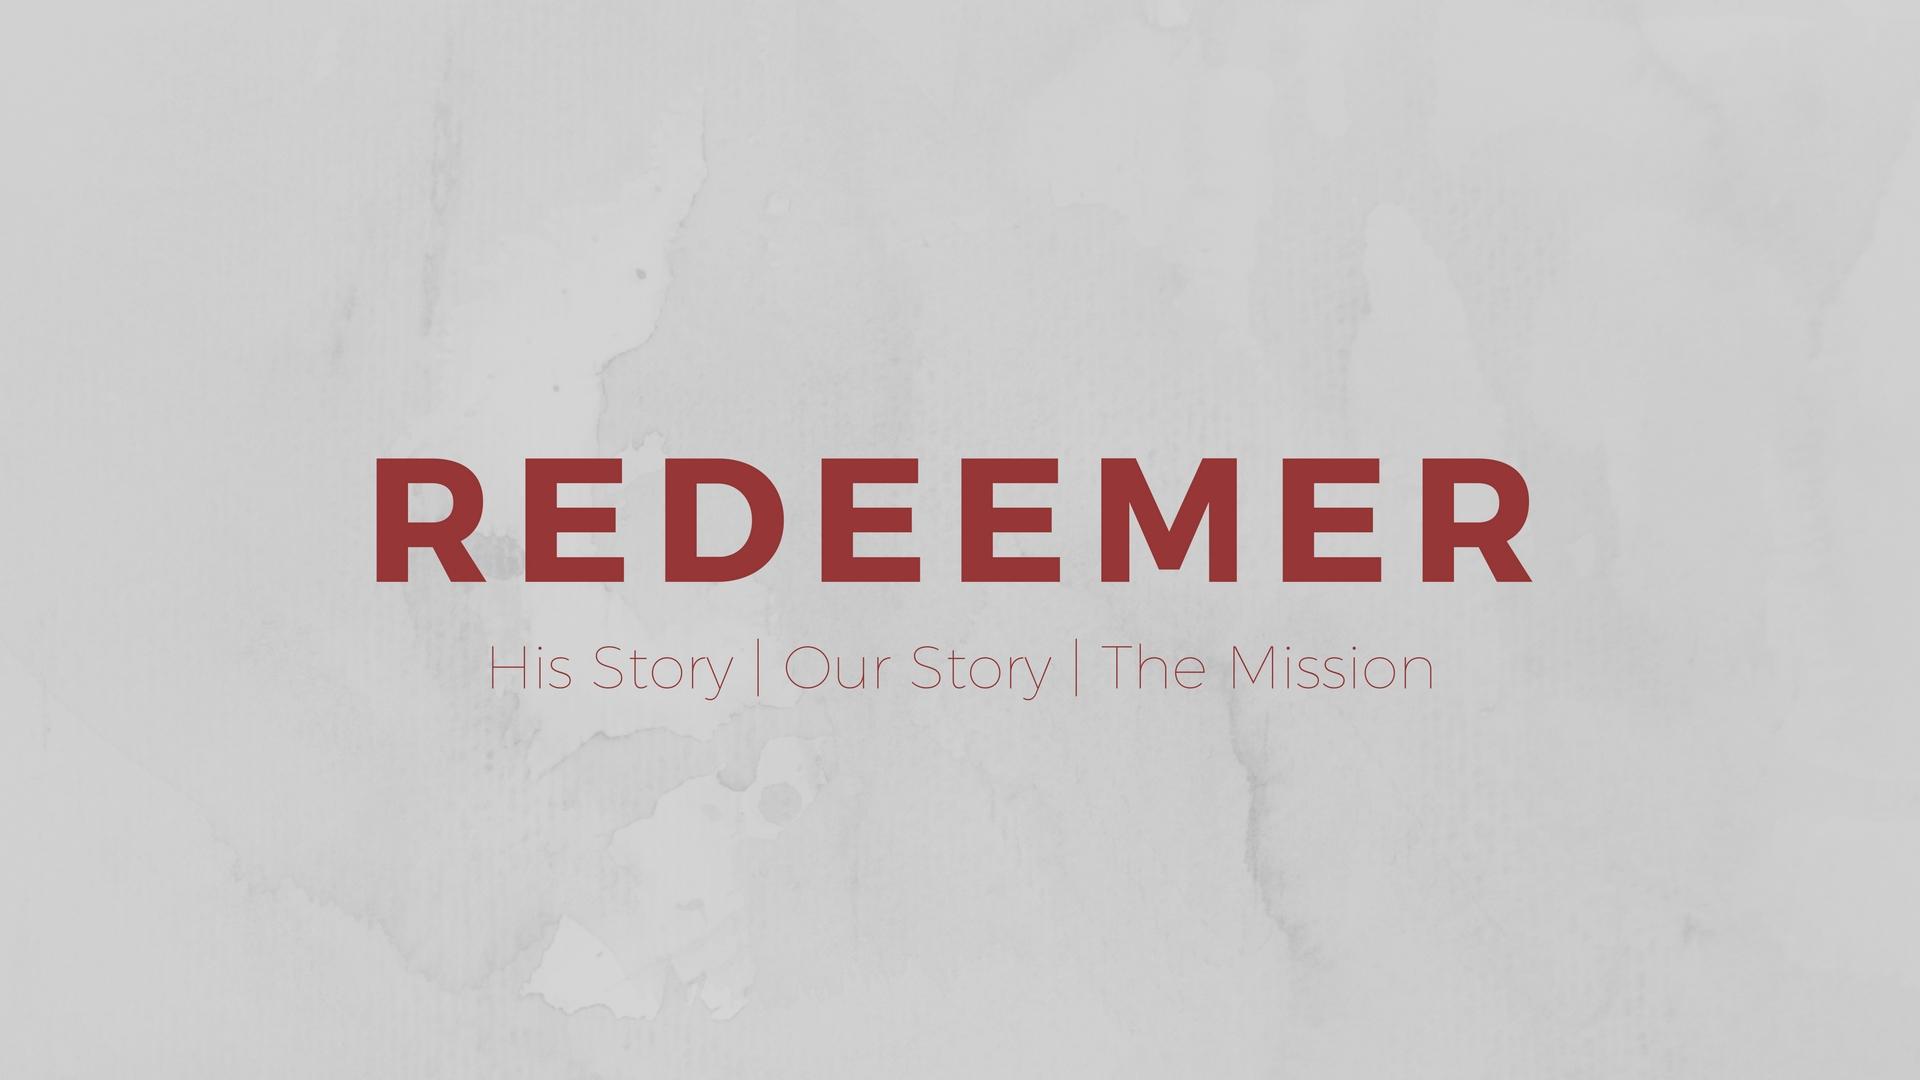 Redeemer Sermon Series Image 16-9.jpg